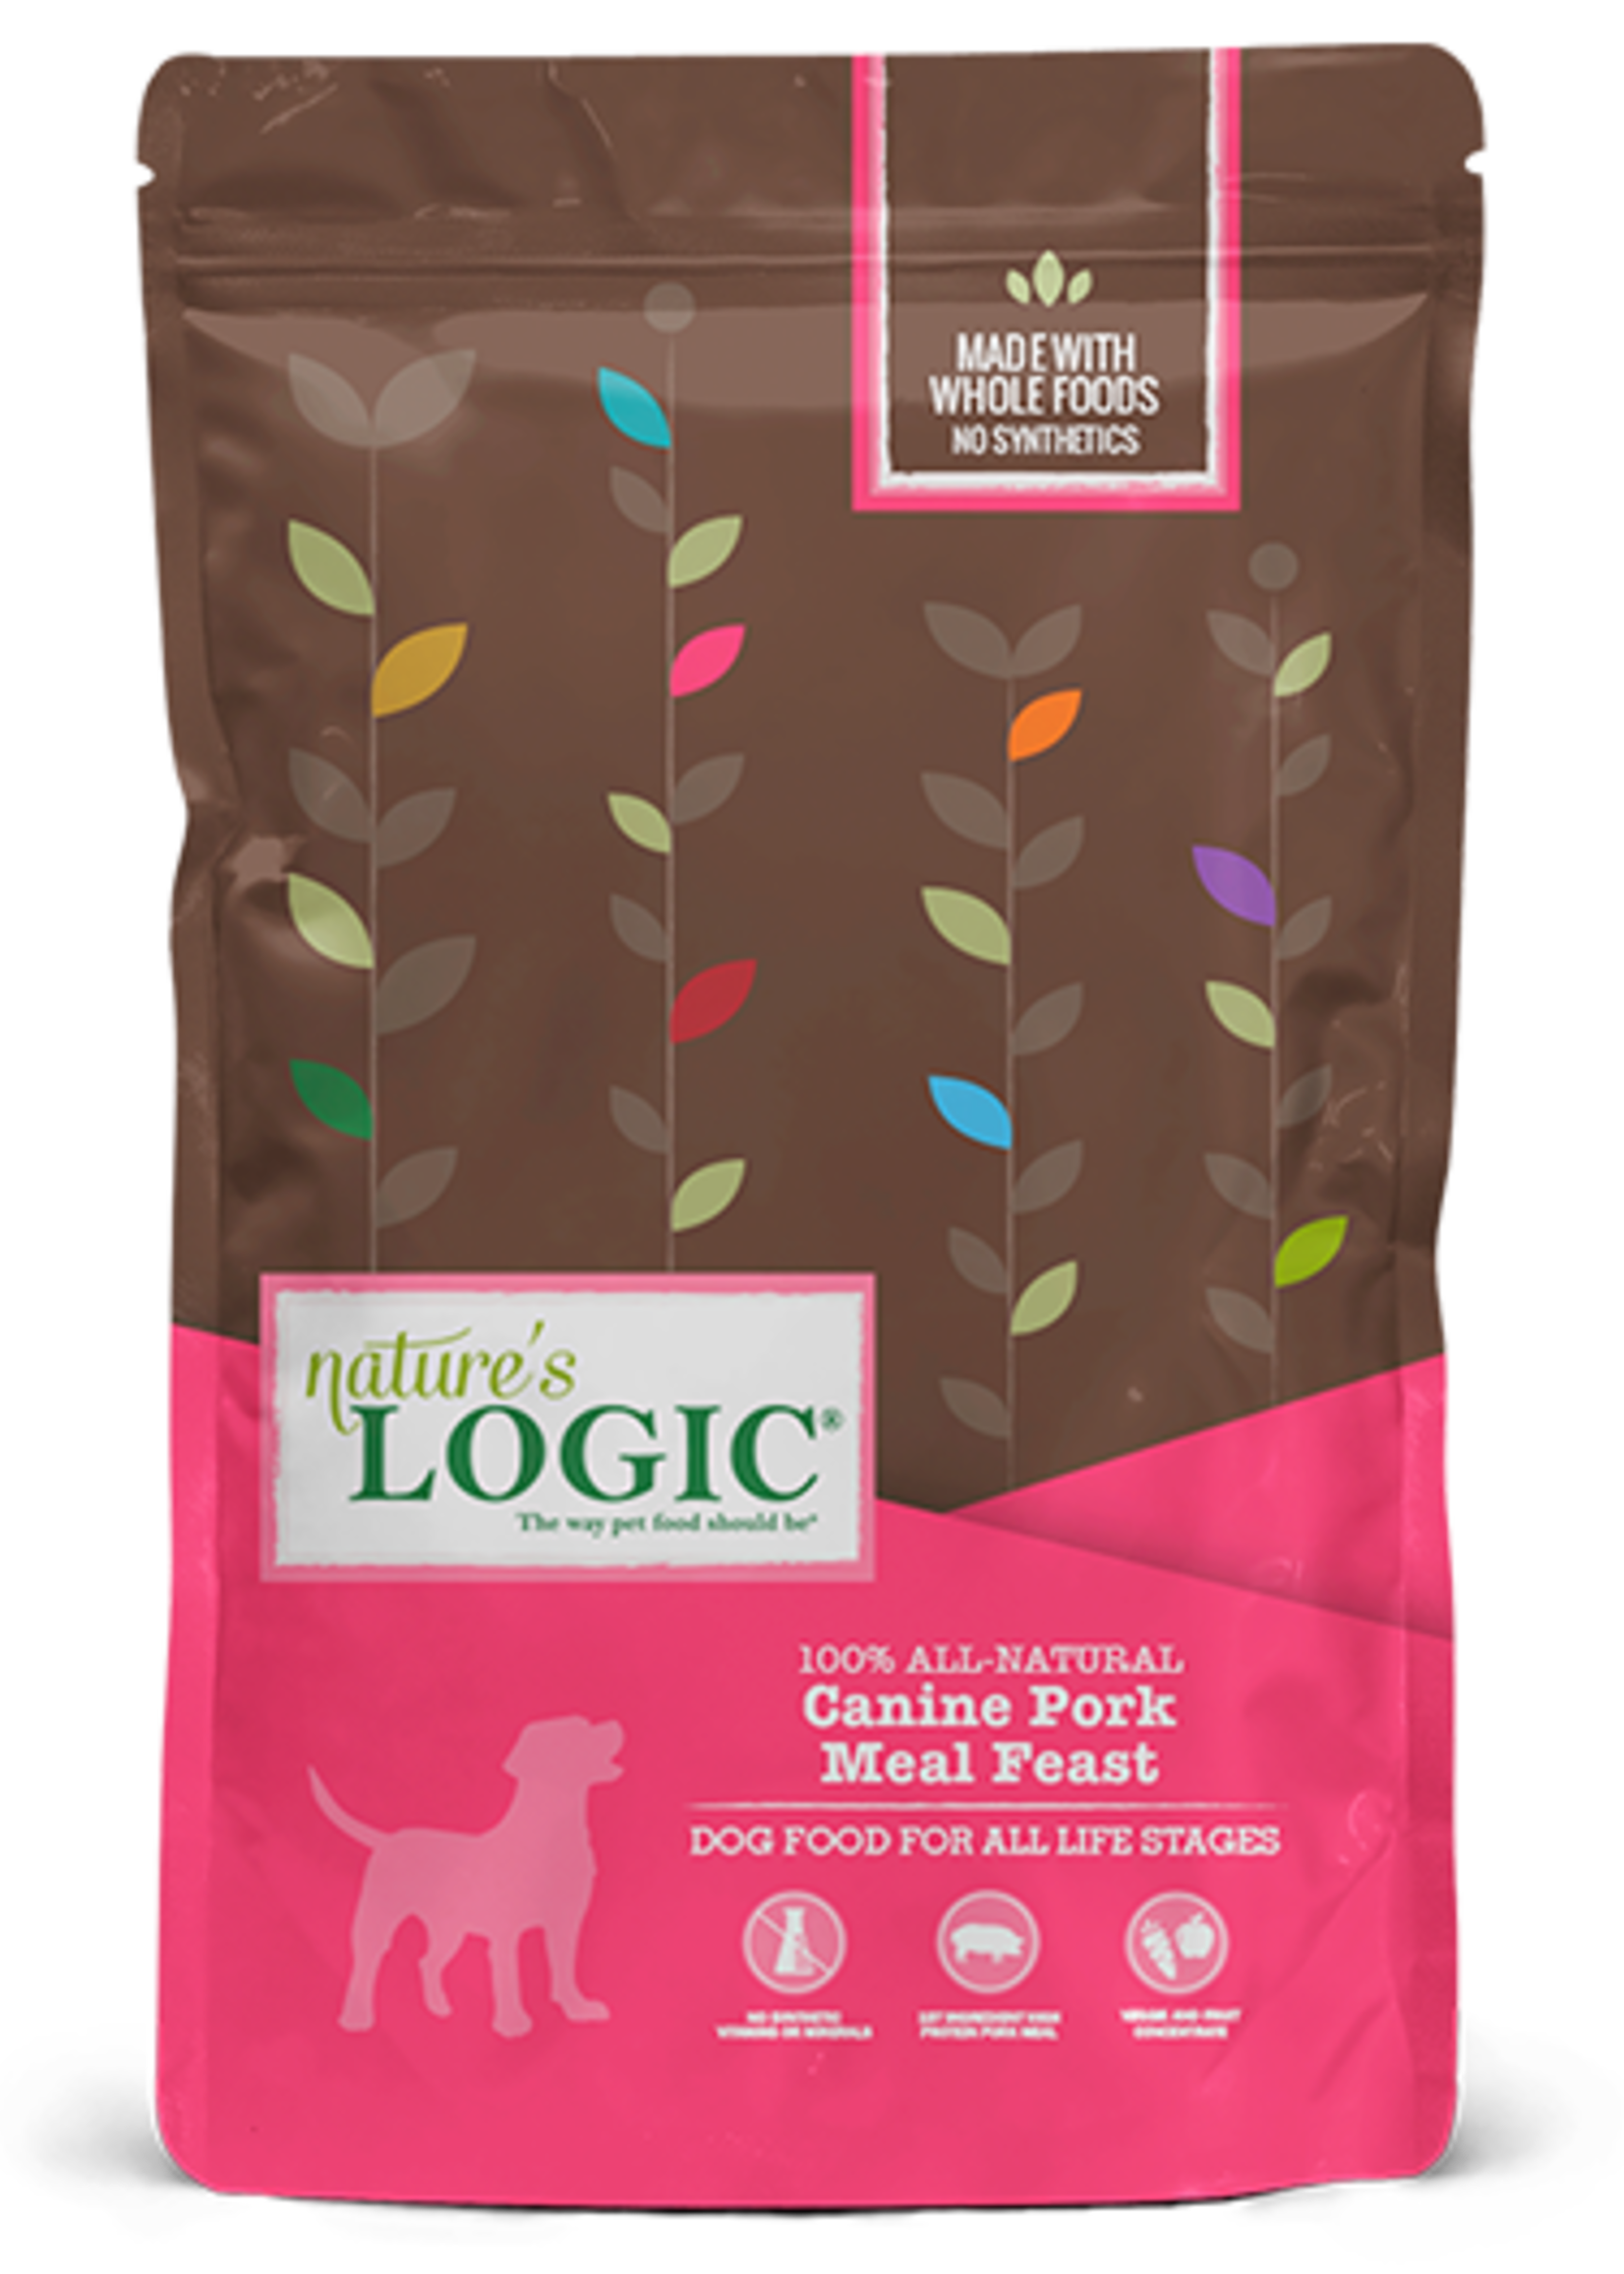 Nature's Logic Nature's Logic Pork Meal Feast Dry Dog Food 13lbs